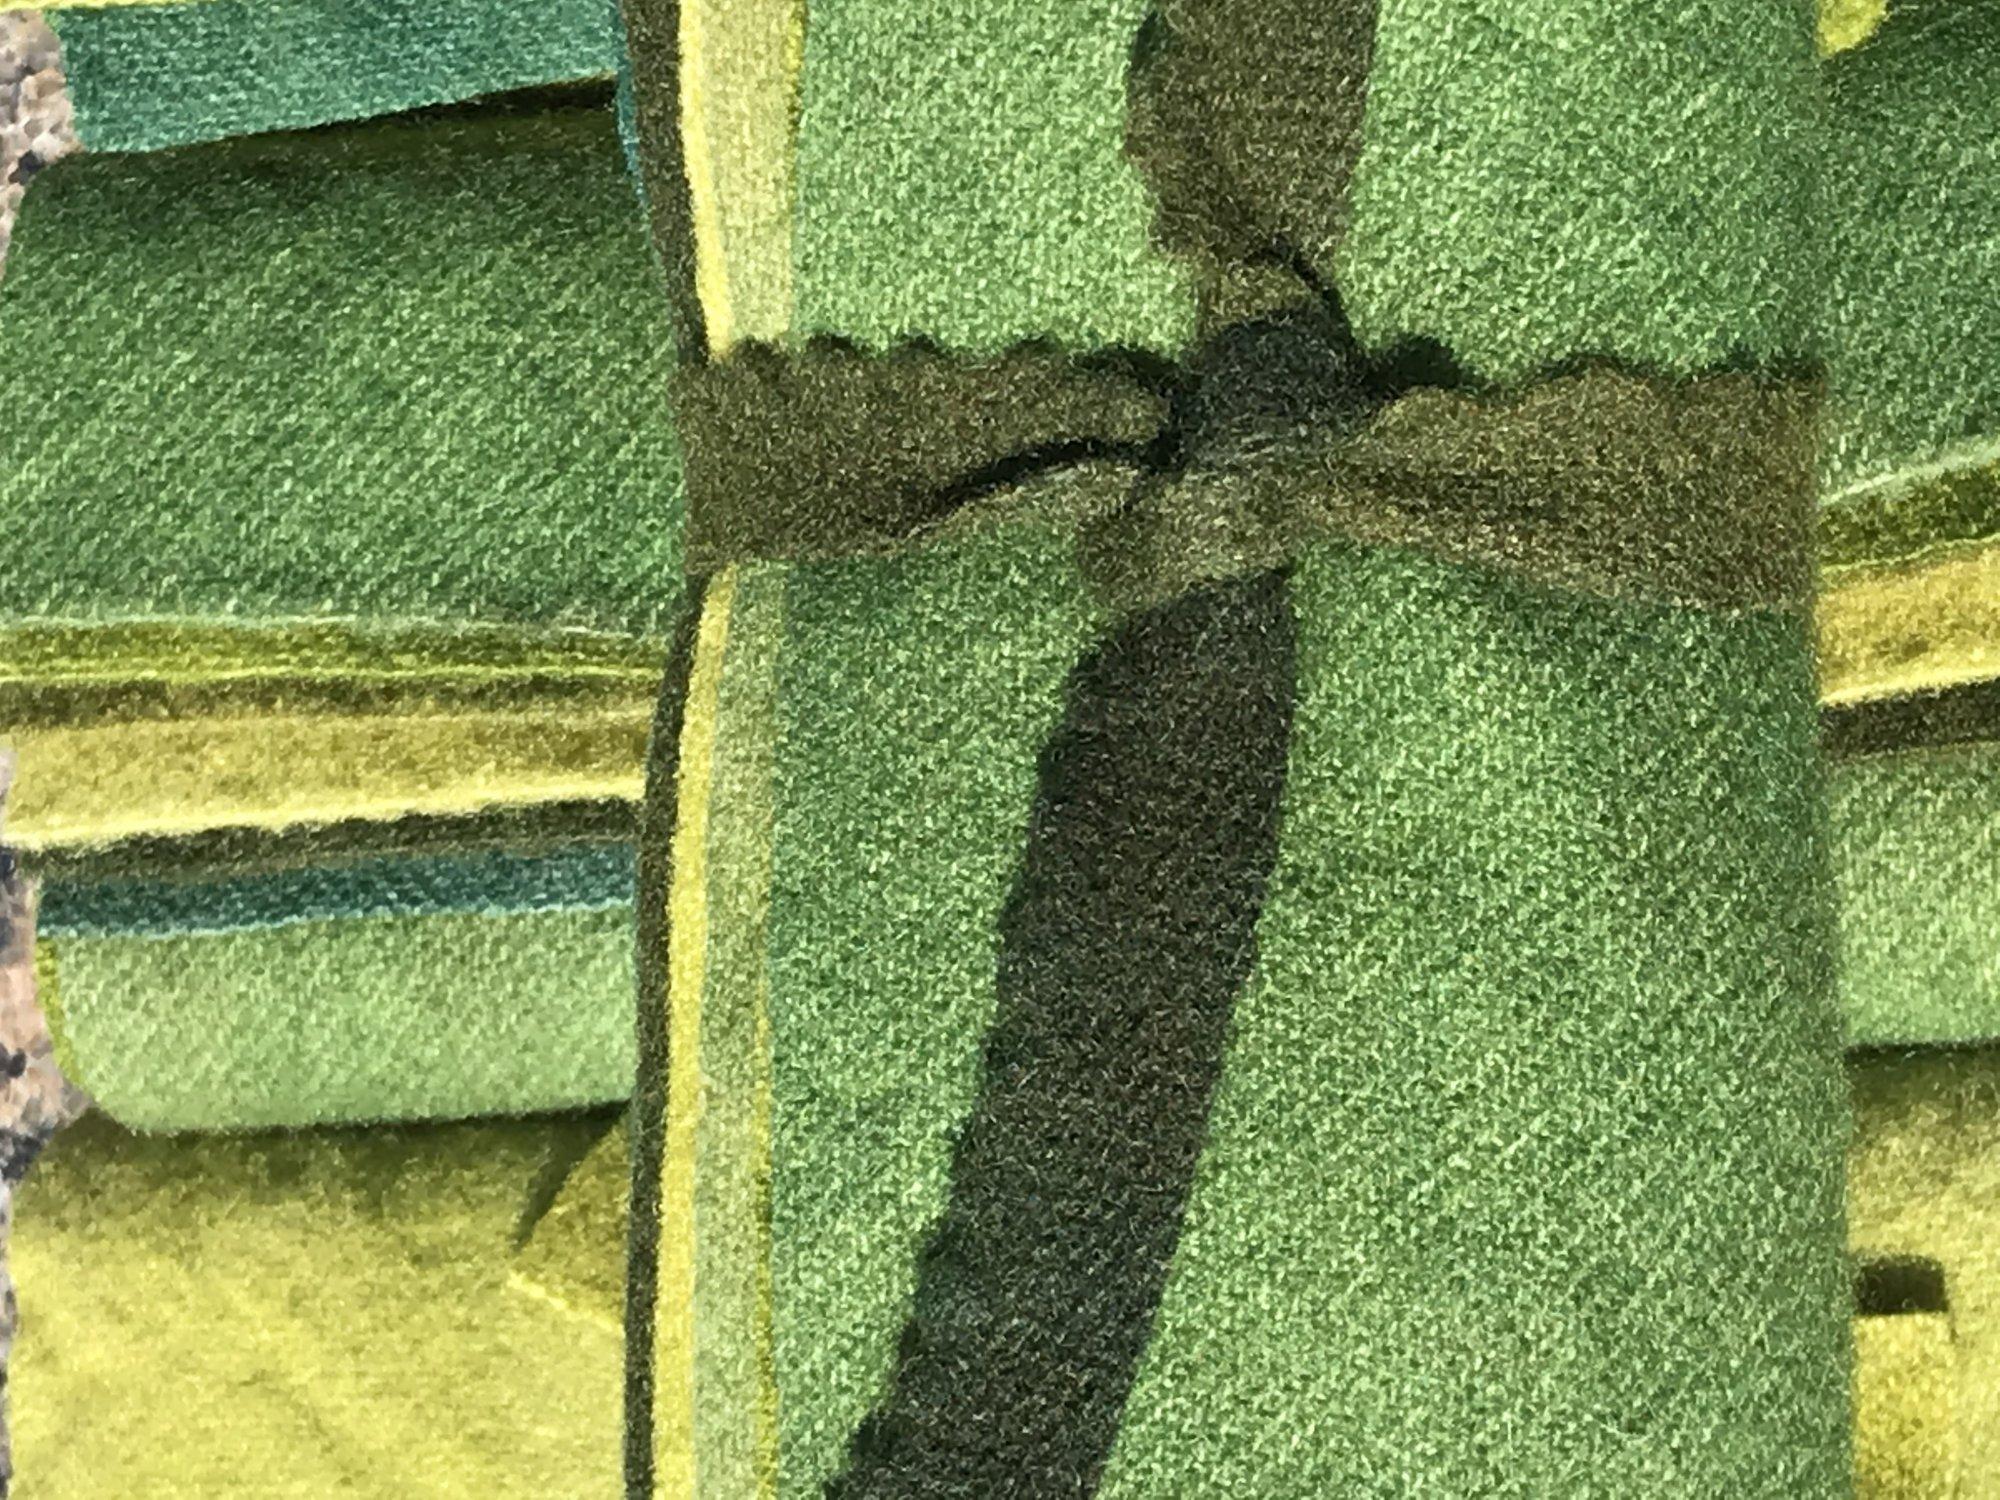 Greens 6 Piece Wool Bundle 6.5 X 7.5